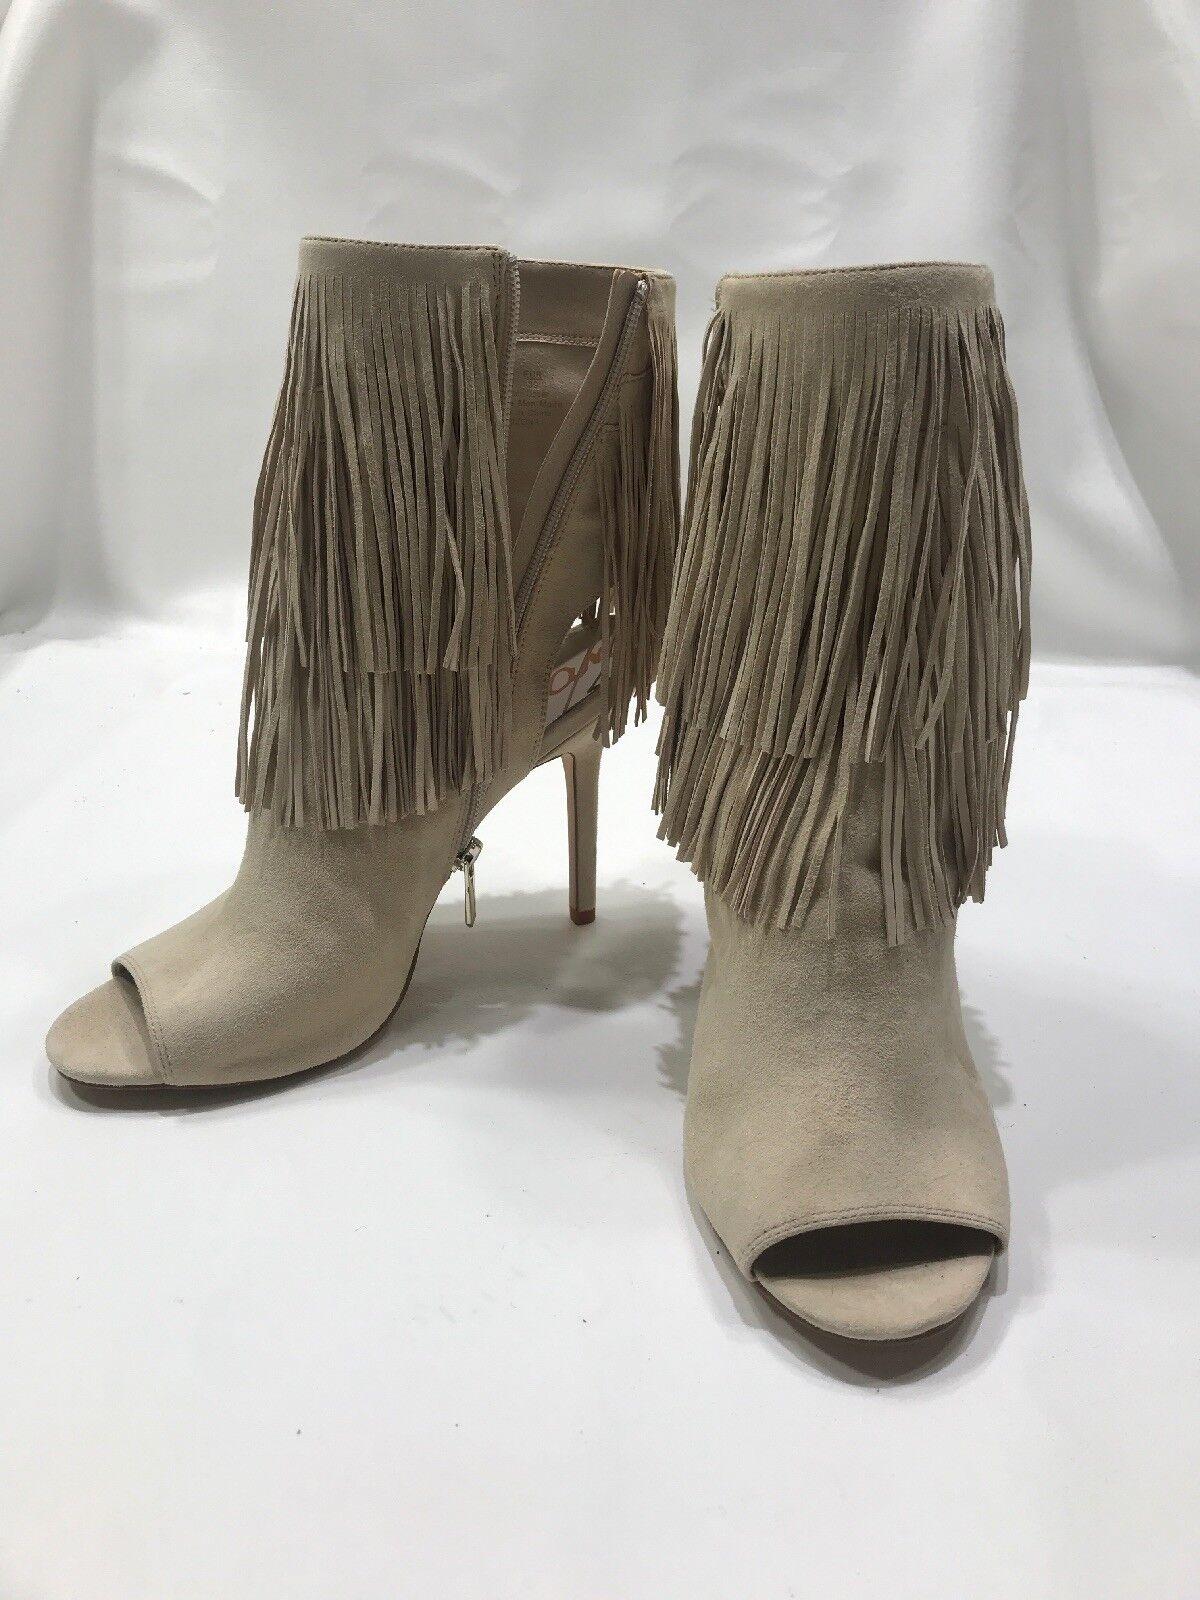 Sam Edelman Talla 9 flecos puntera abierta al al al tobillo Botines Beige botas De Gamuza  marca de lujo